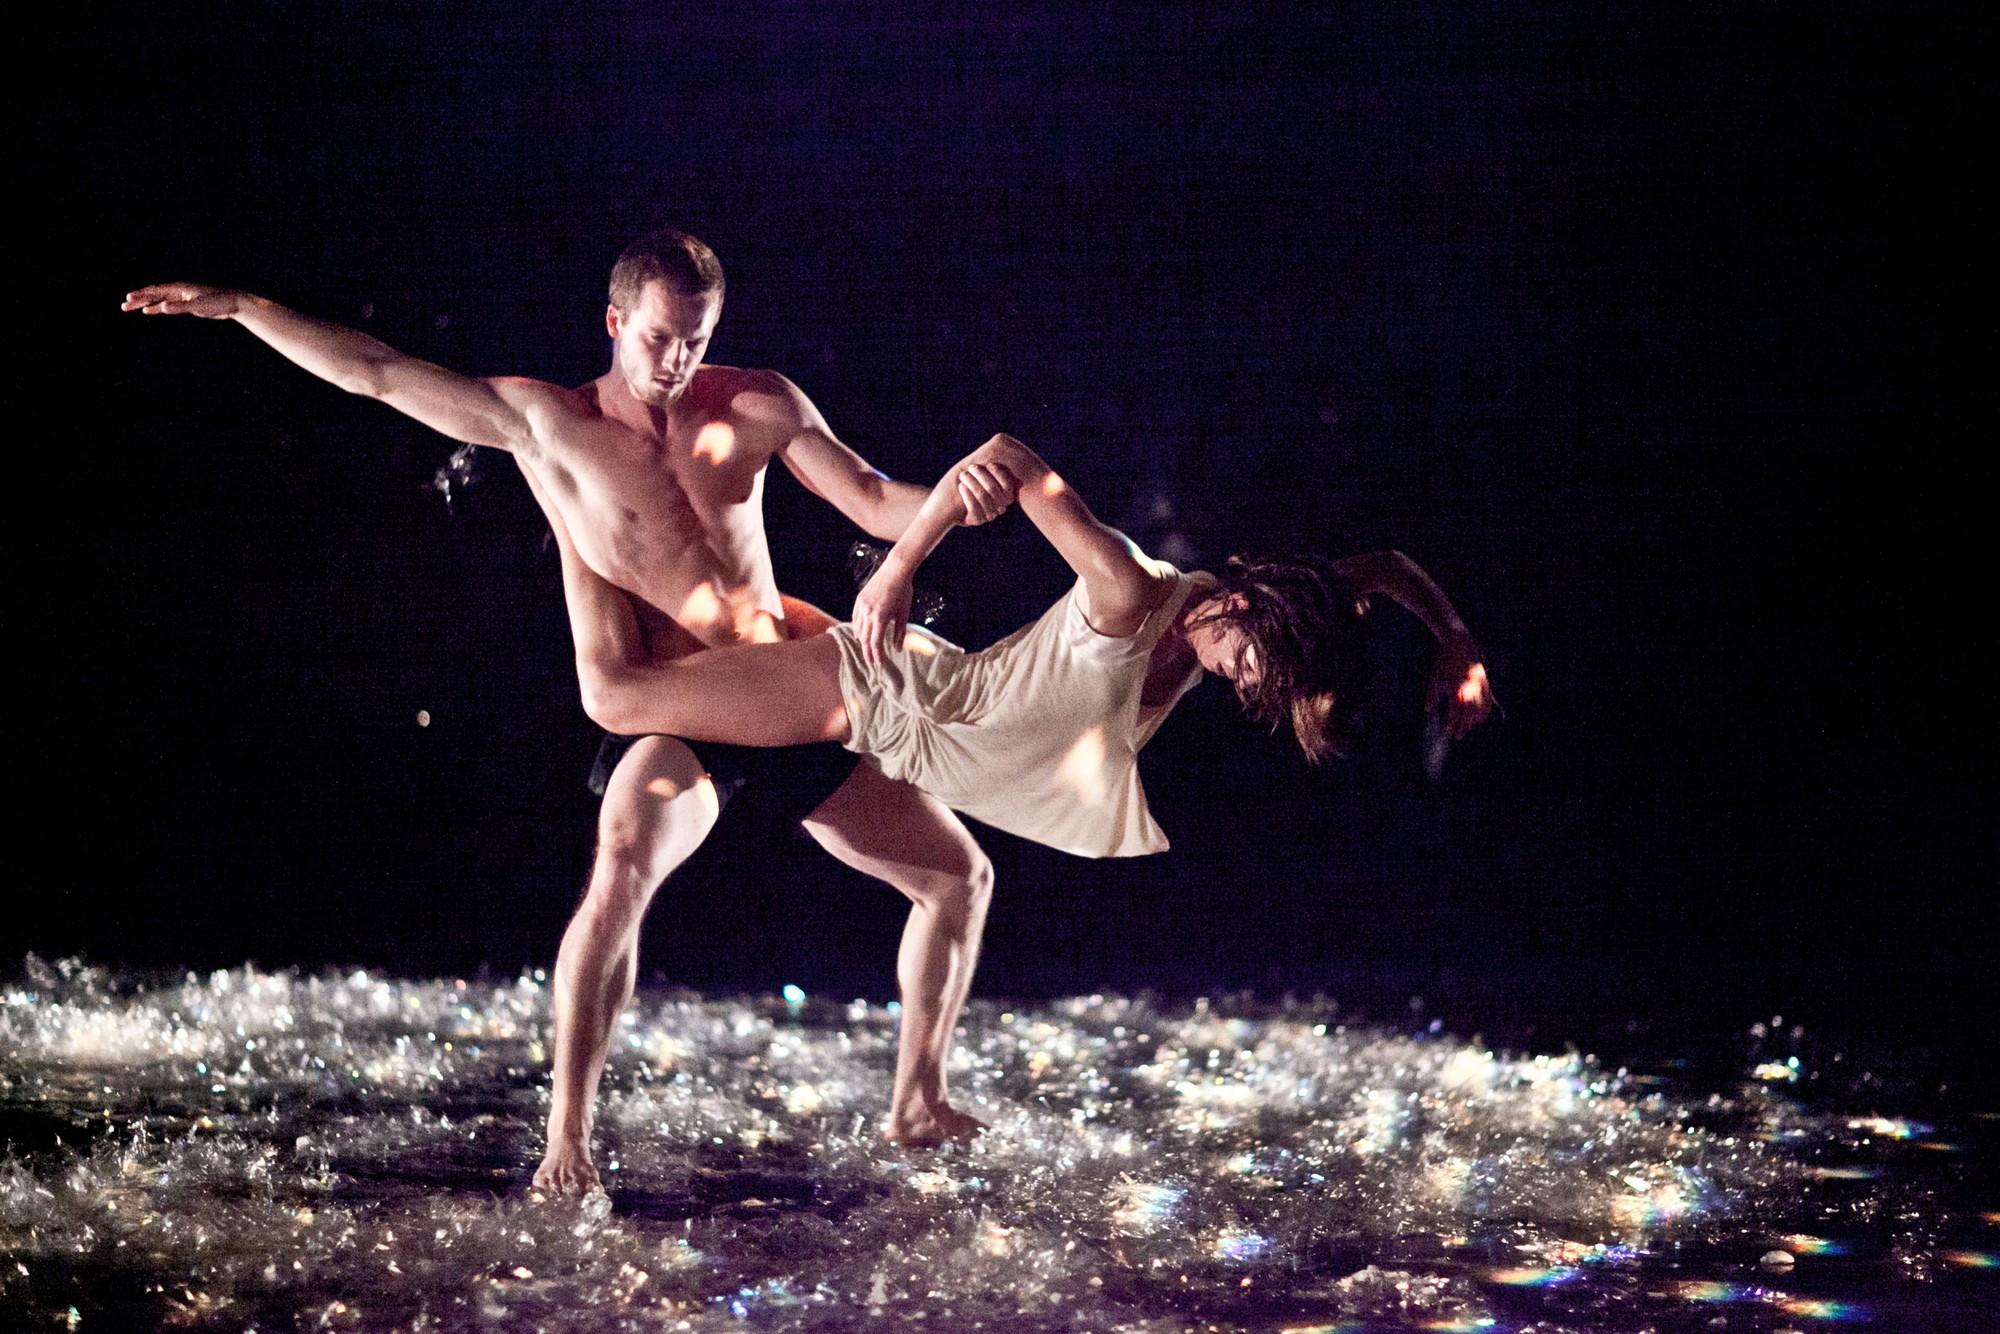 """Guess how many stars are there"", Pražský Komorní Balet, fot. Pavel Hejn (źródło: materiały prasowe organizatora)"